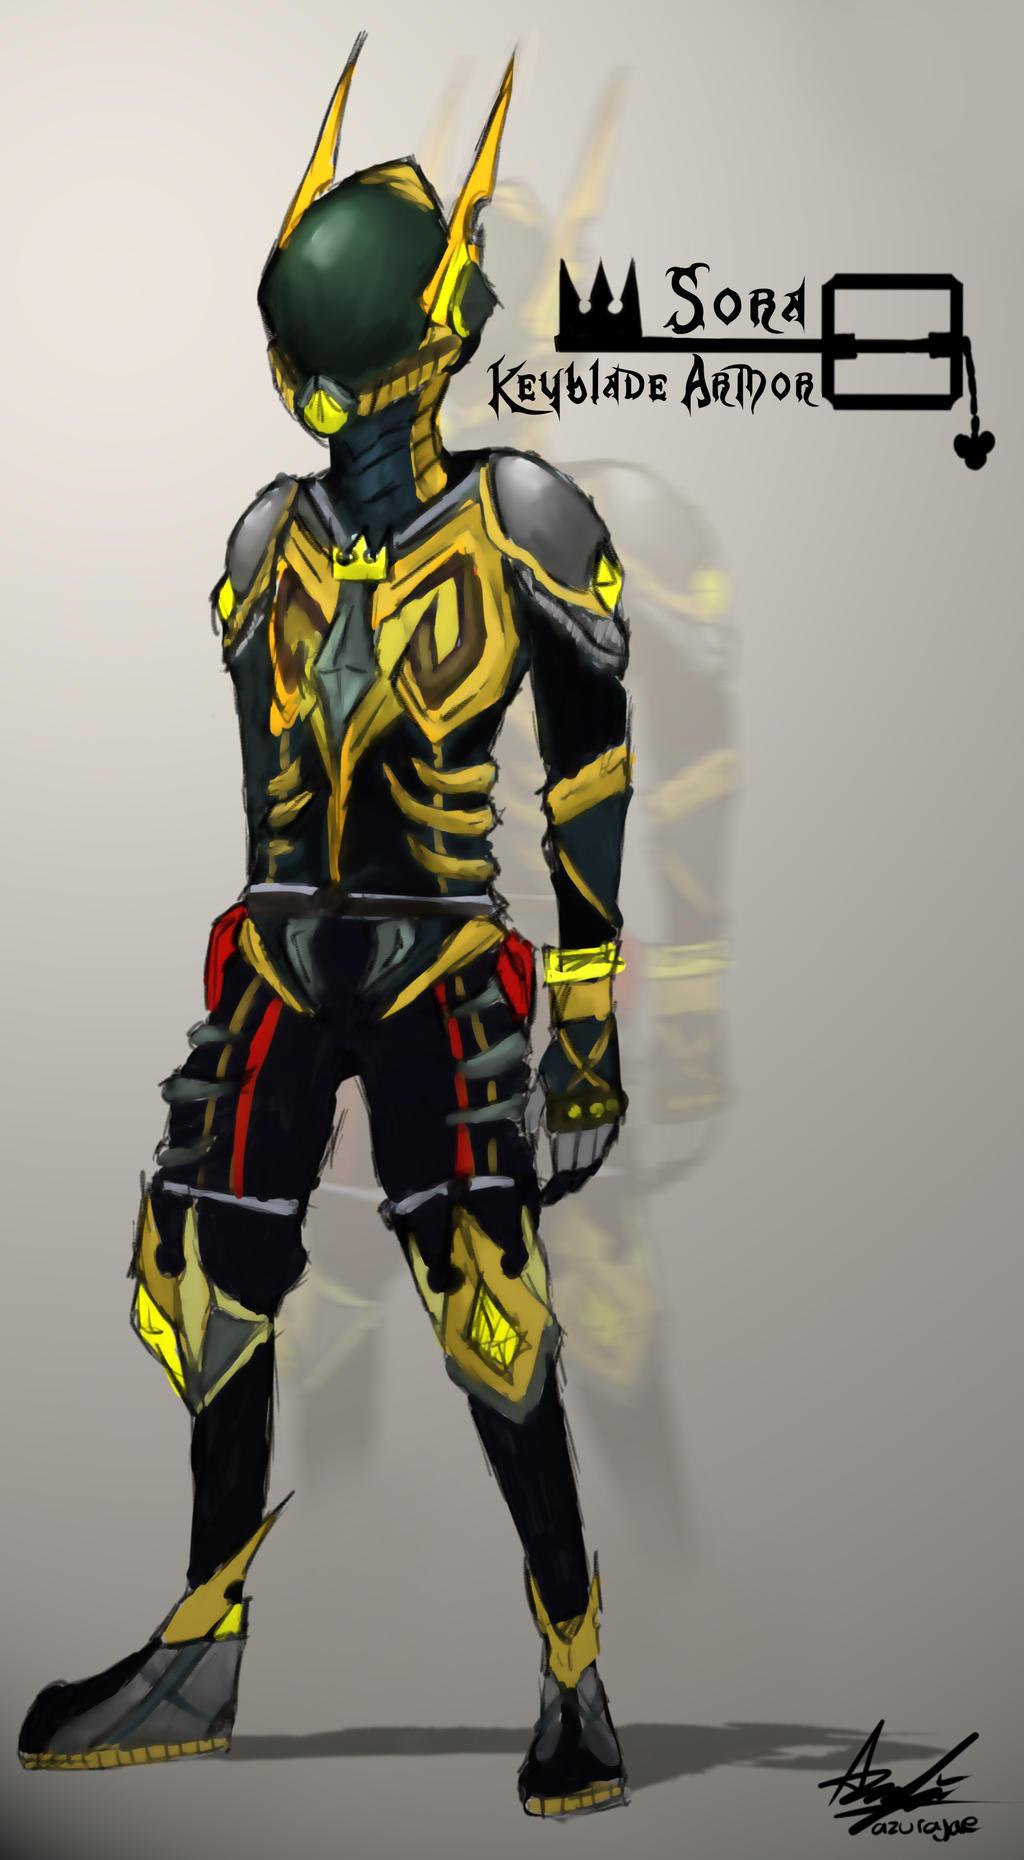 sora keyblade armor by azurajae on deviantart